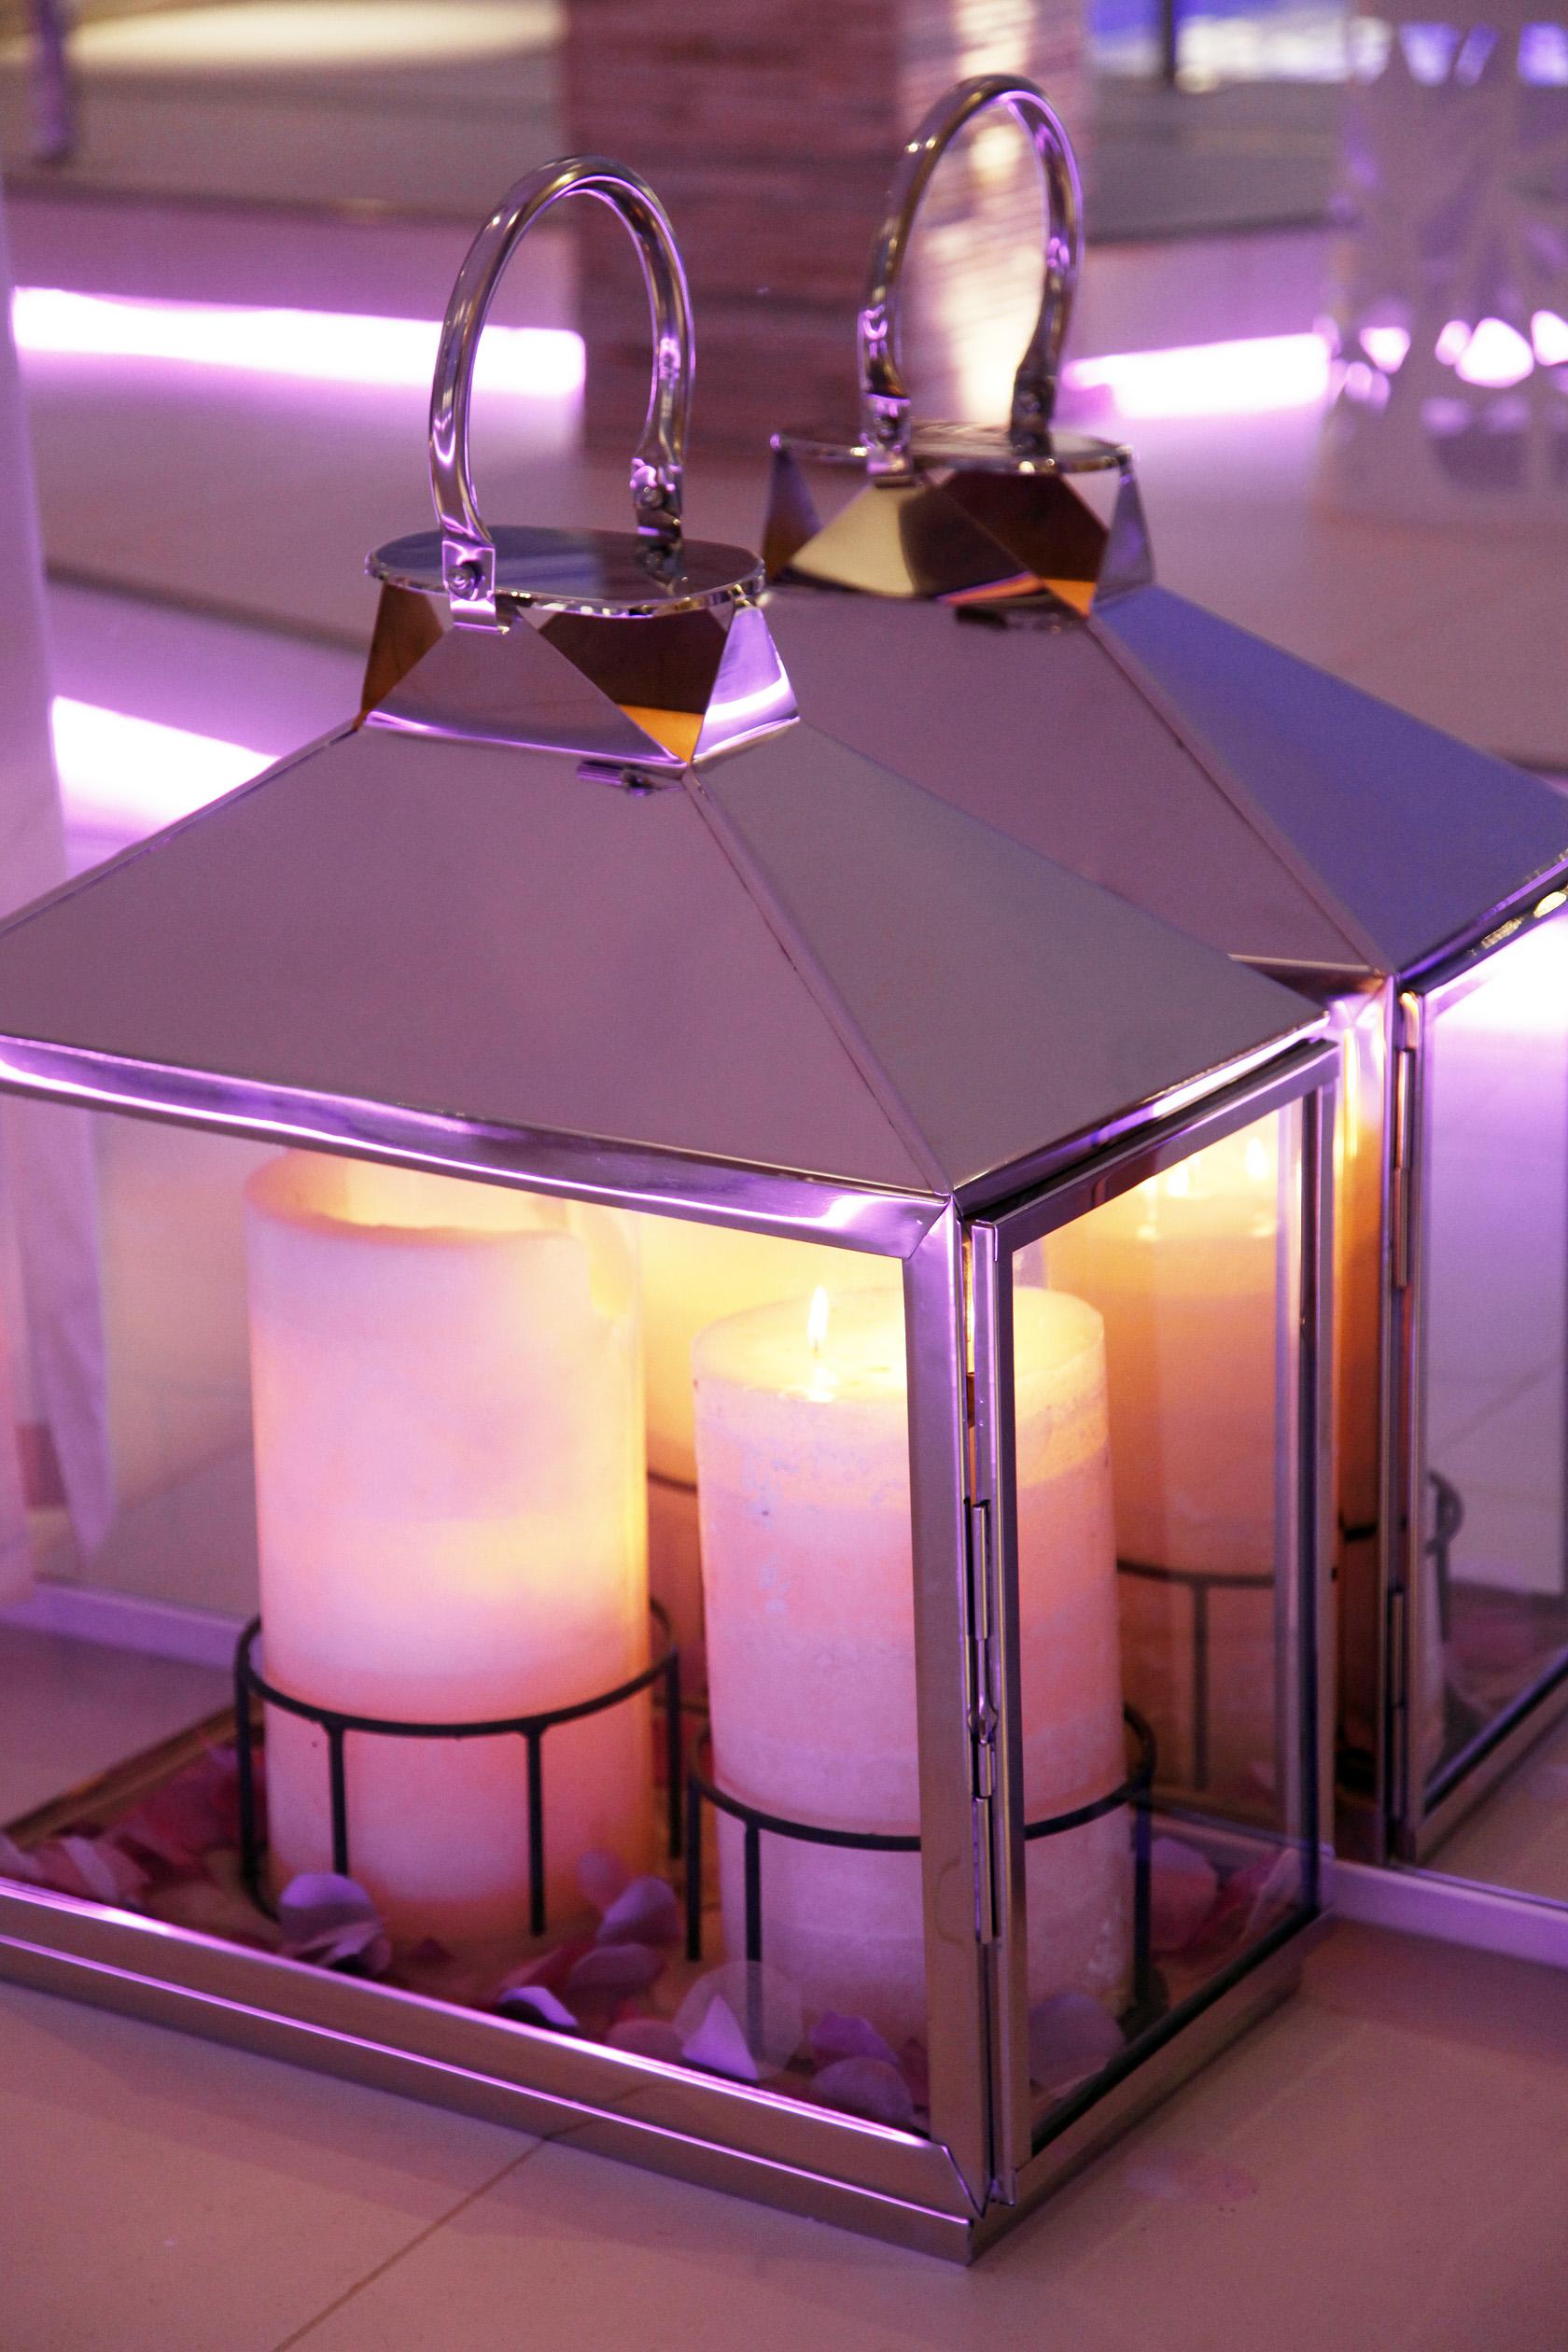 spa la cascade dalmine4 spa hotel parigi 2 hotel a. Black Bedroom Furniture Sets. Home Design Ideas